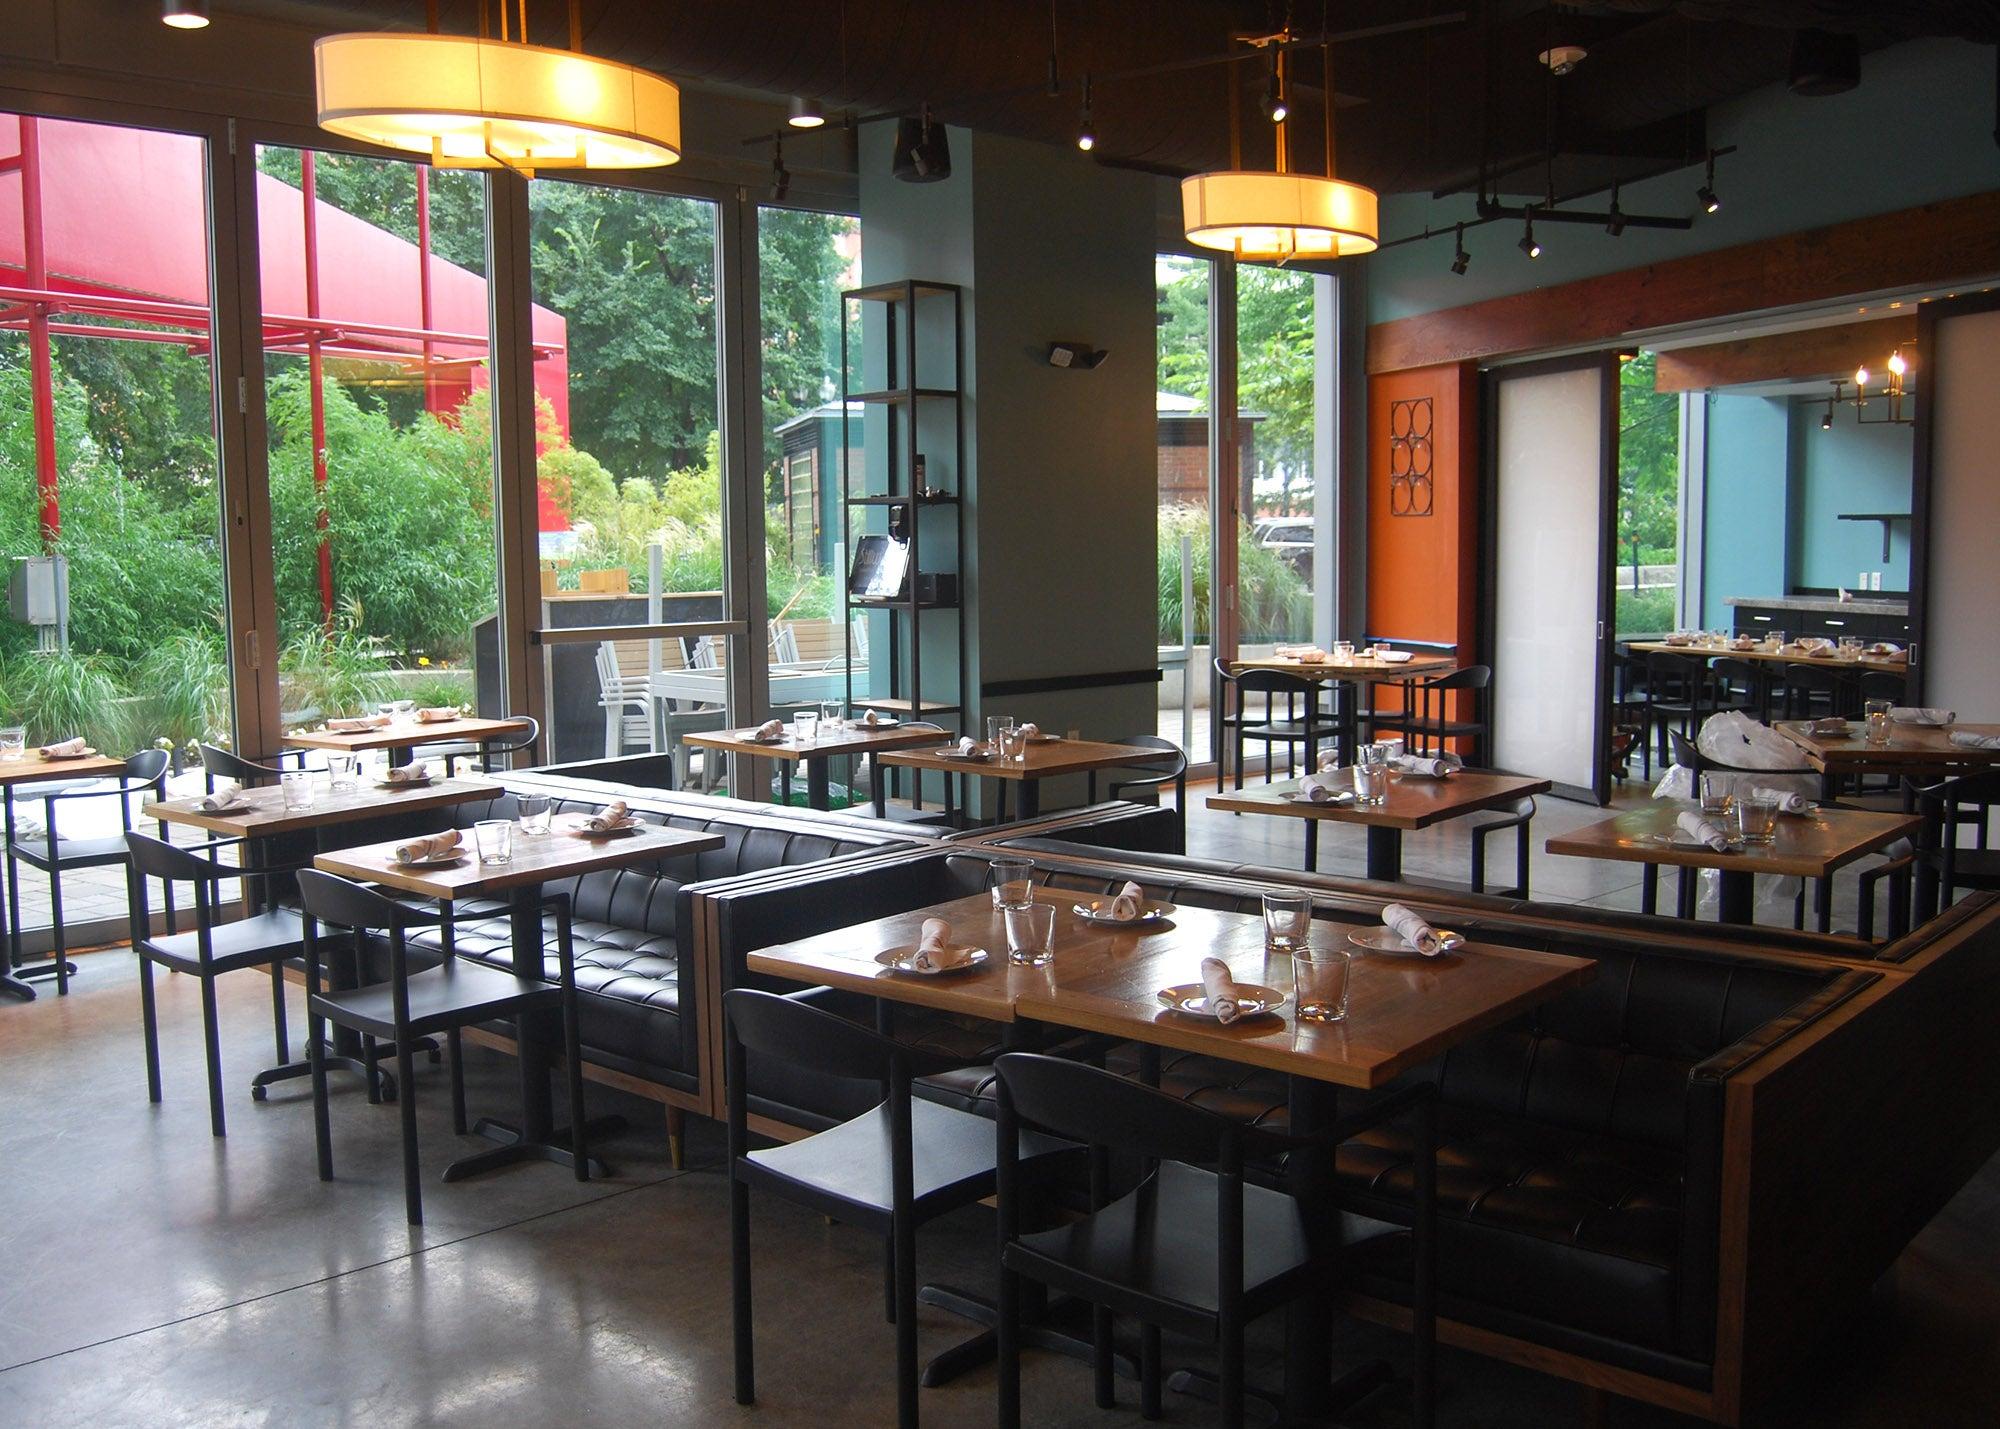 The dining room at Stillwater